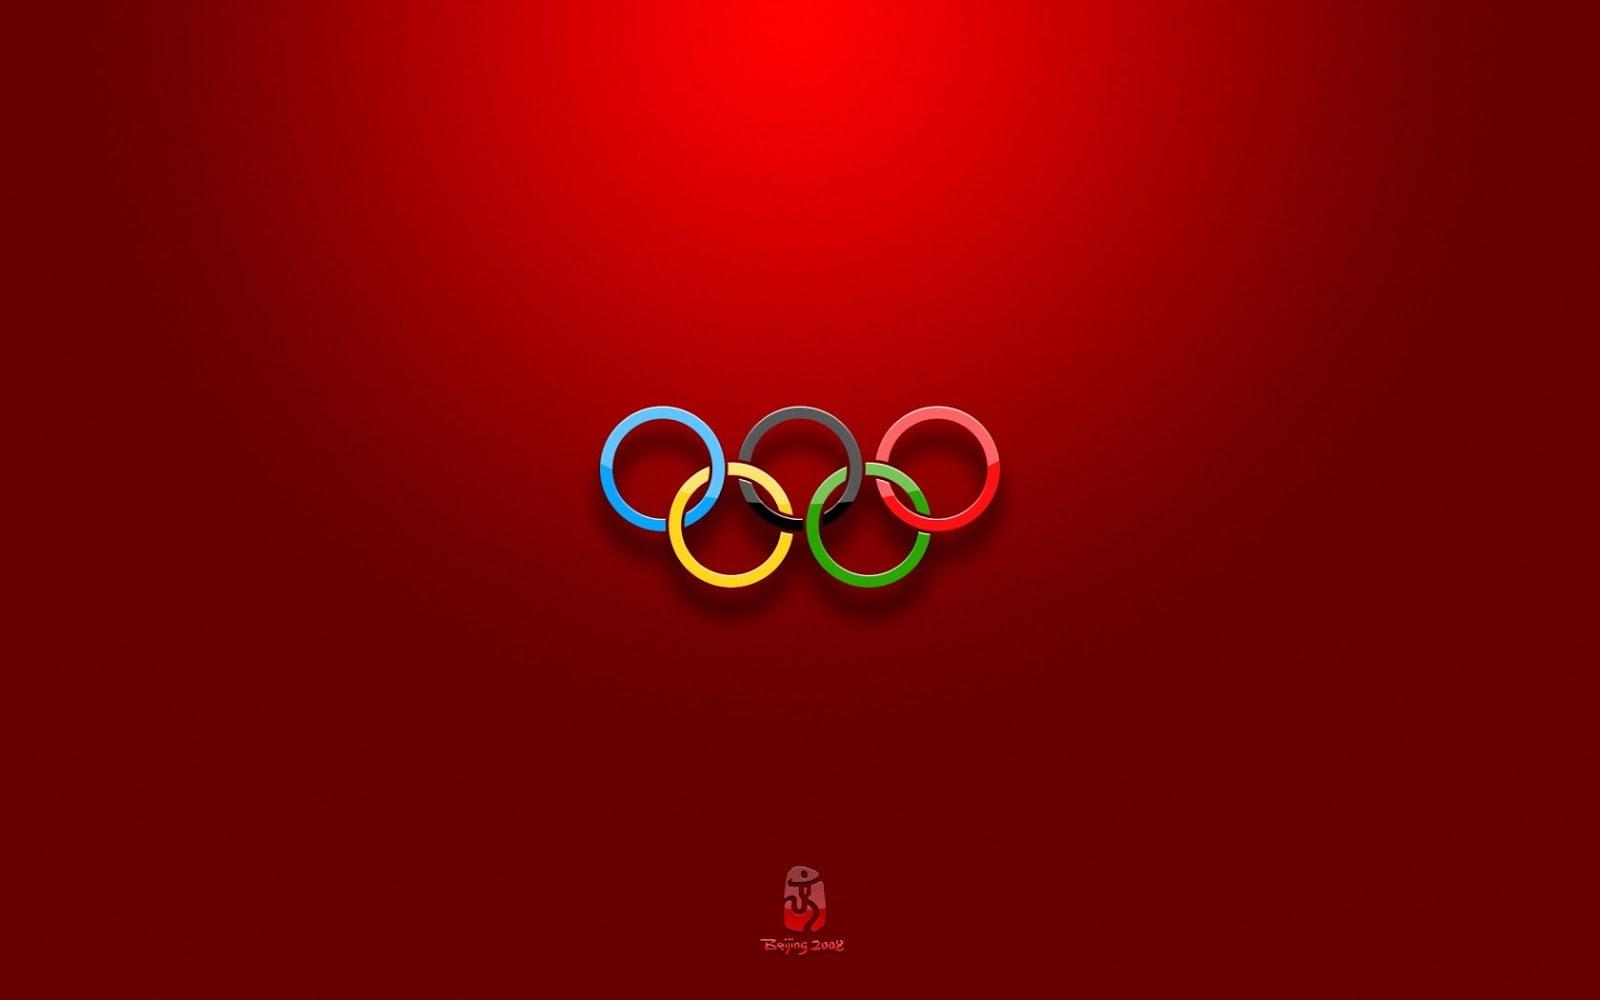 Olympic Flag Wallpaper wwwtopsimagescom 1600x1000